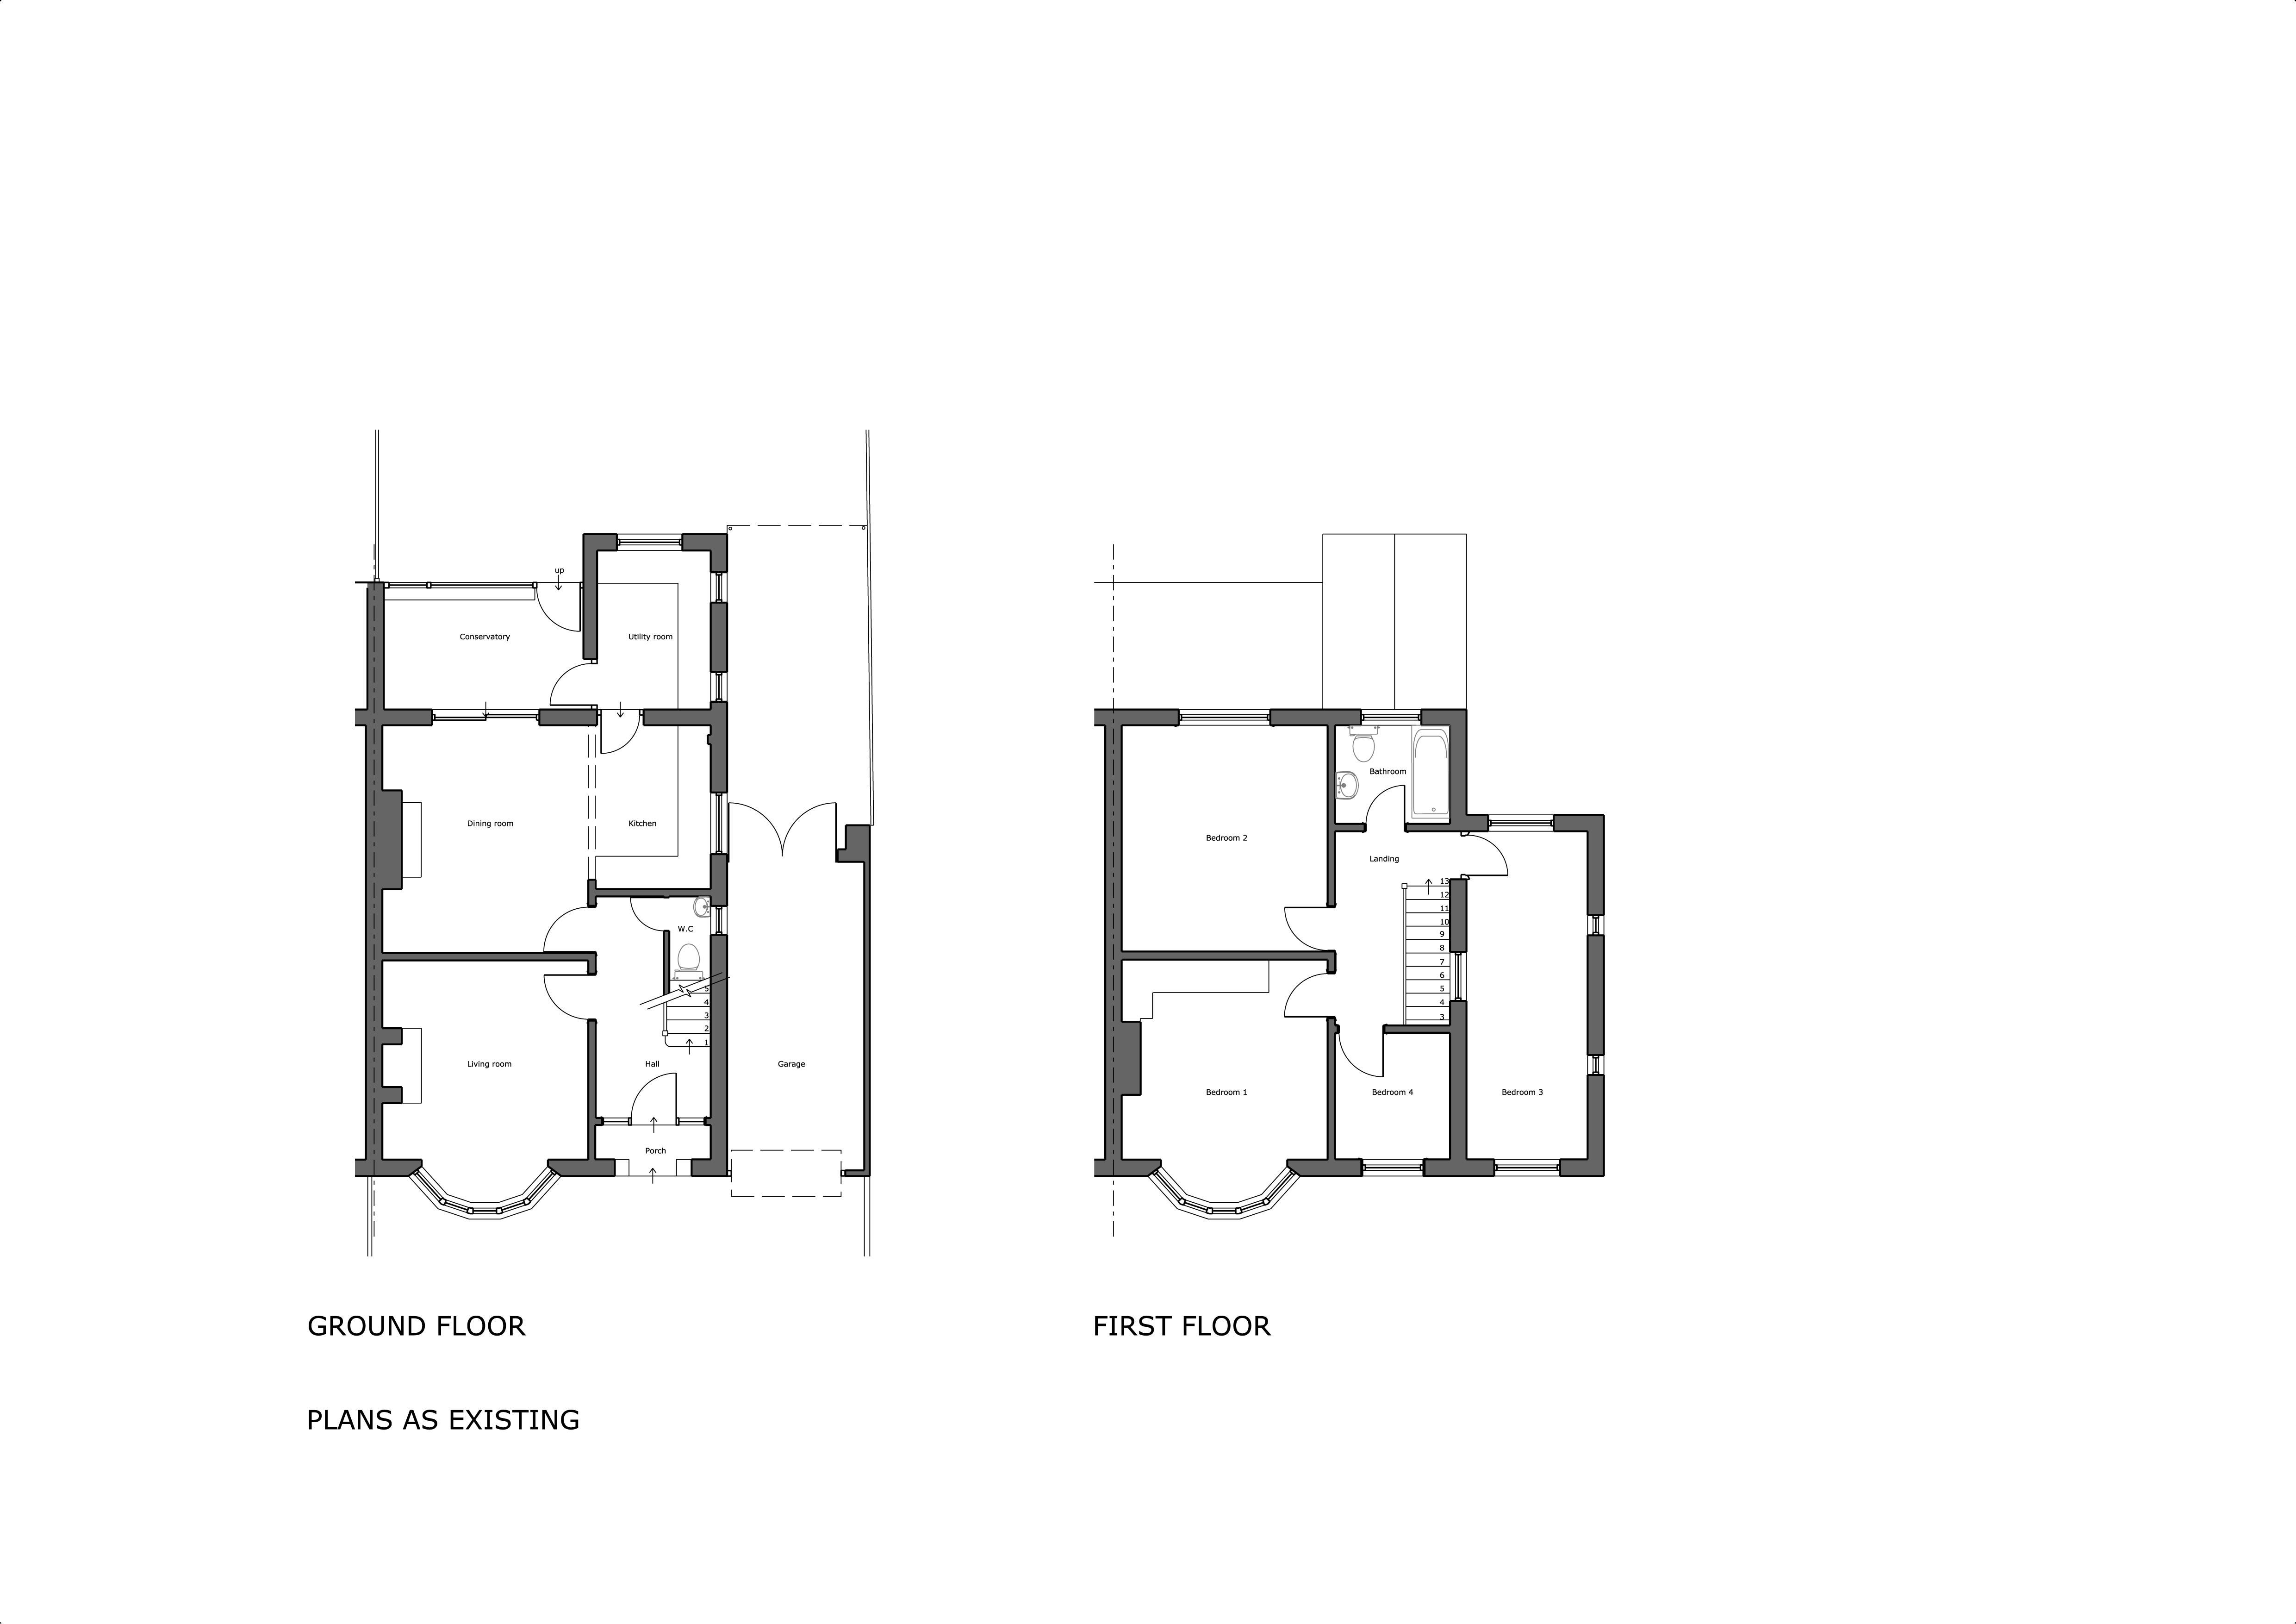 255 Ledbury Rd Existing Plans